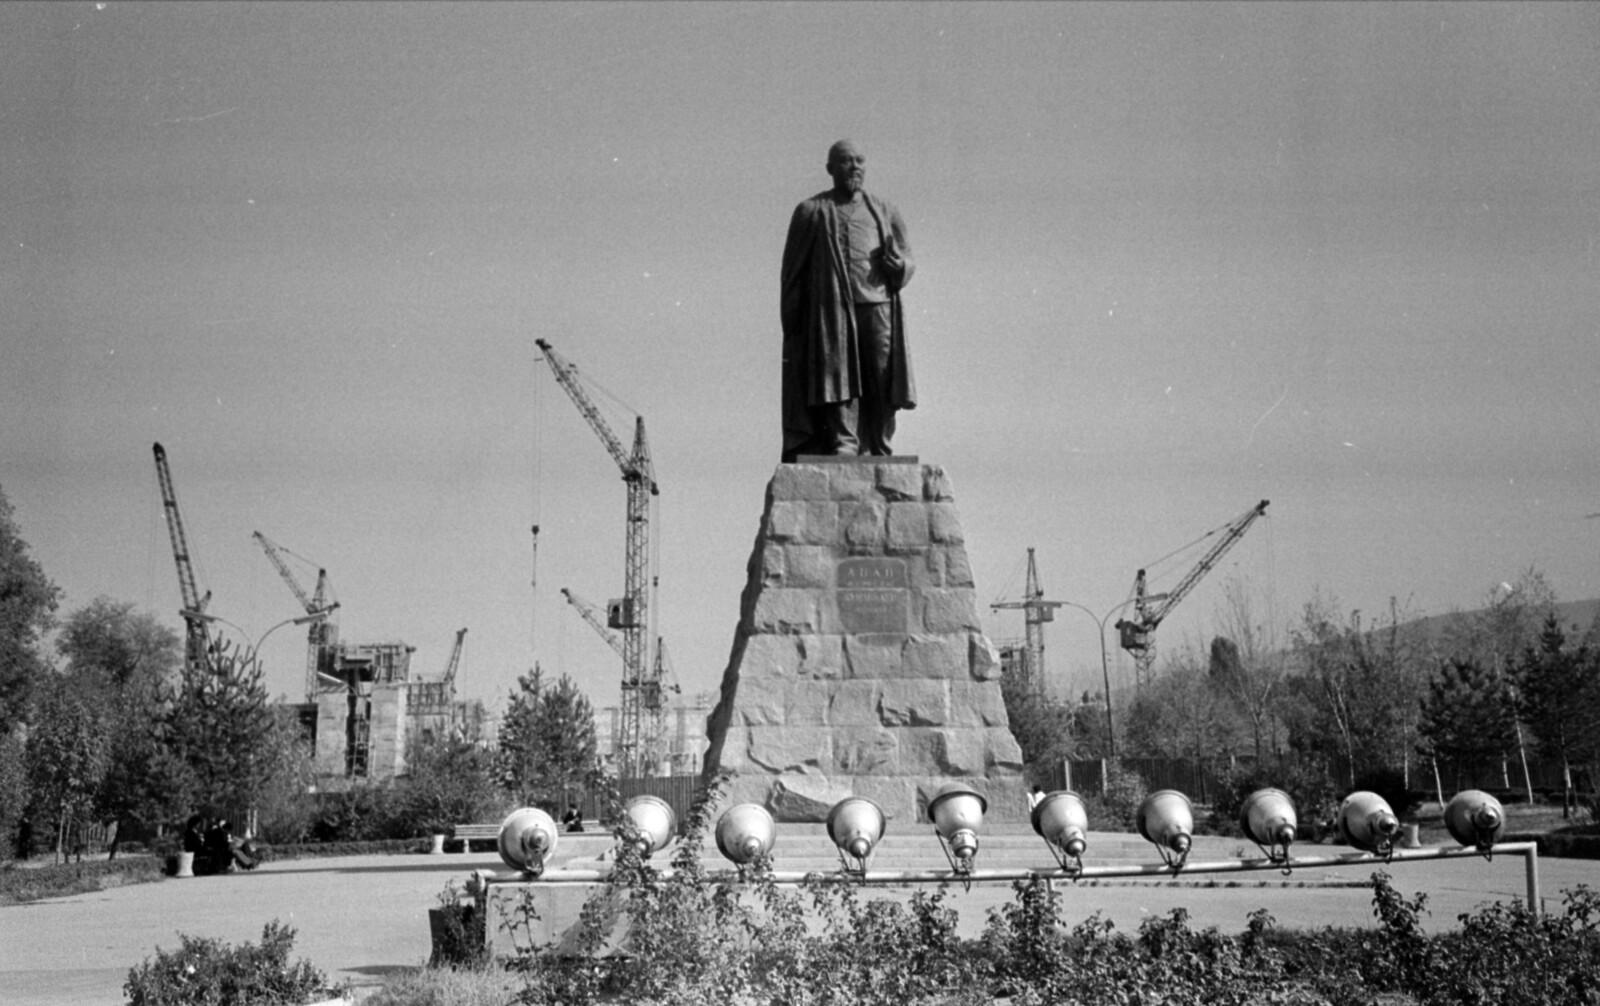 05. Алма-Ата. Проспект Абая, напротив памятника Абаю Кунанбаеву